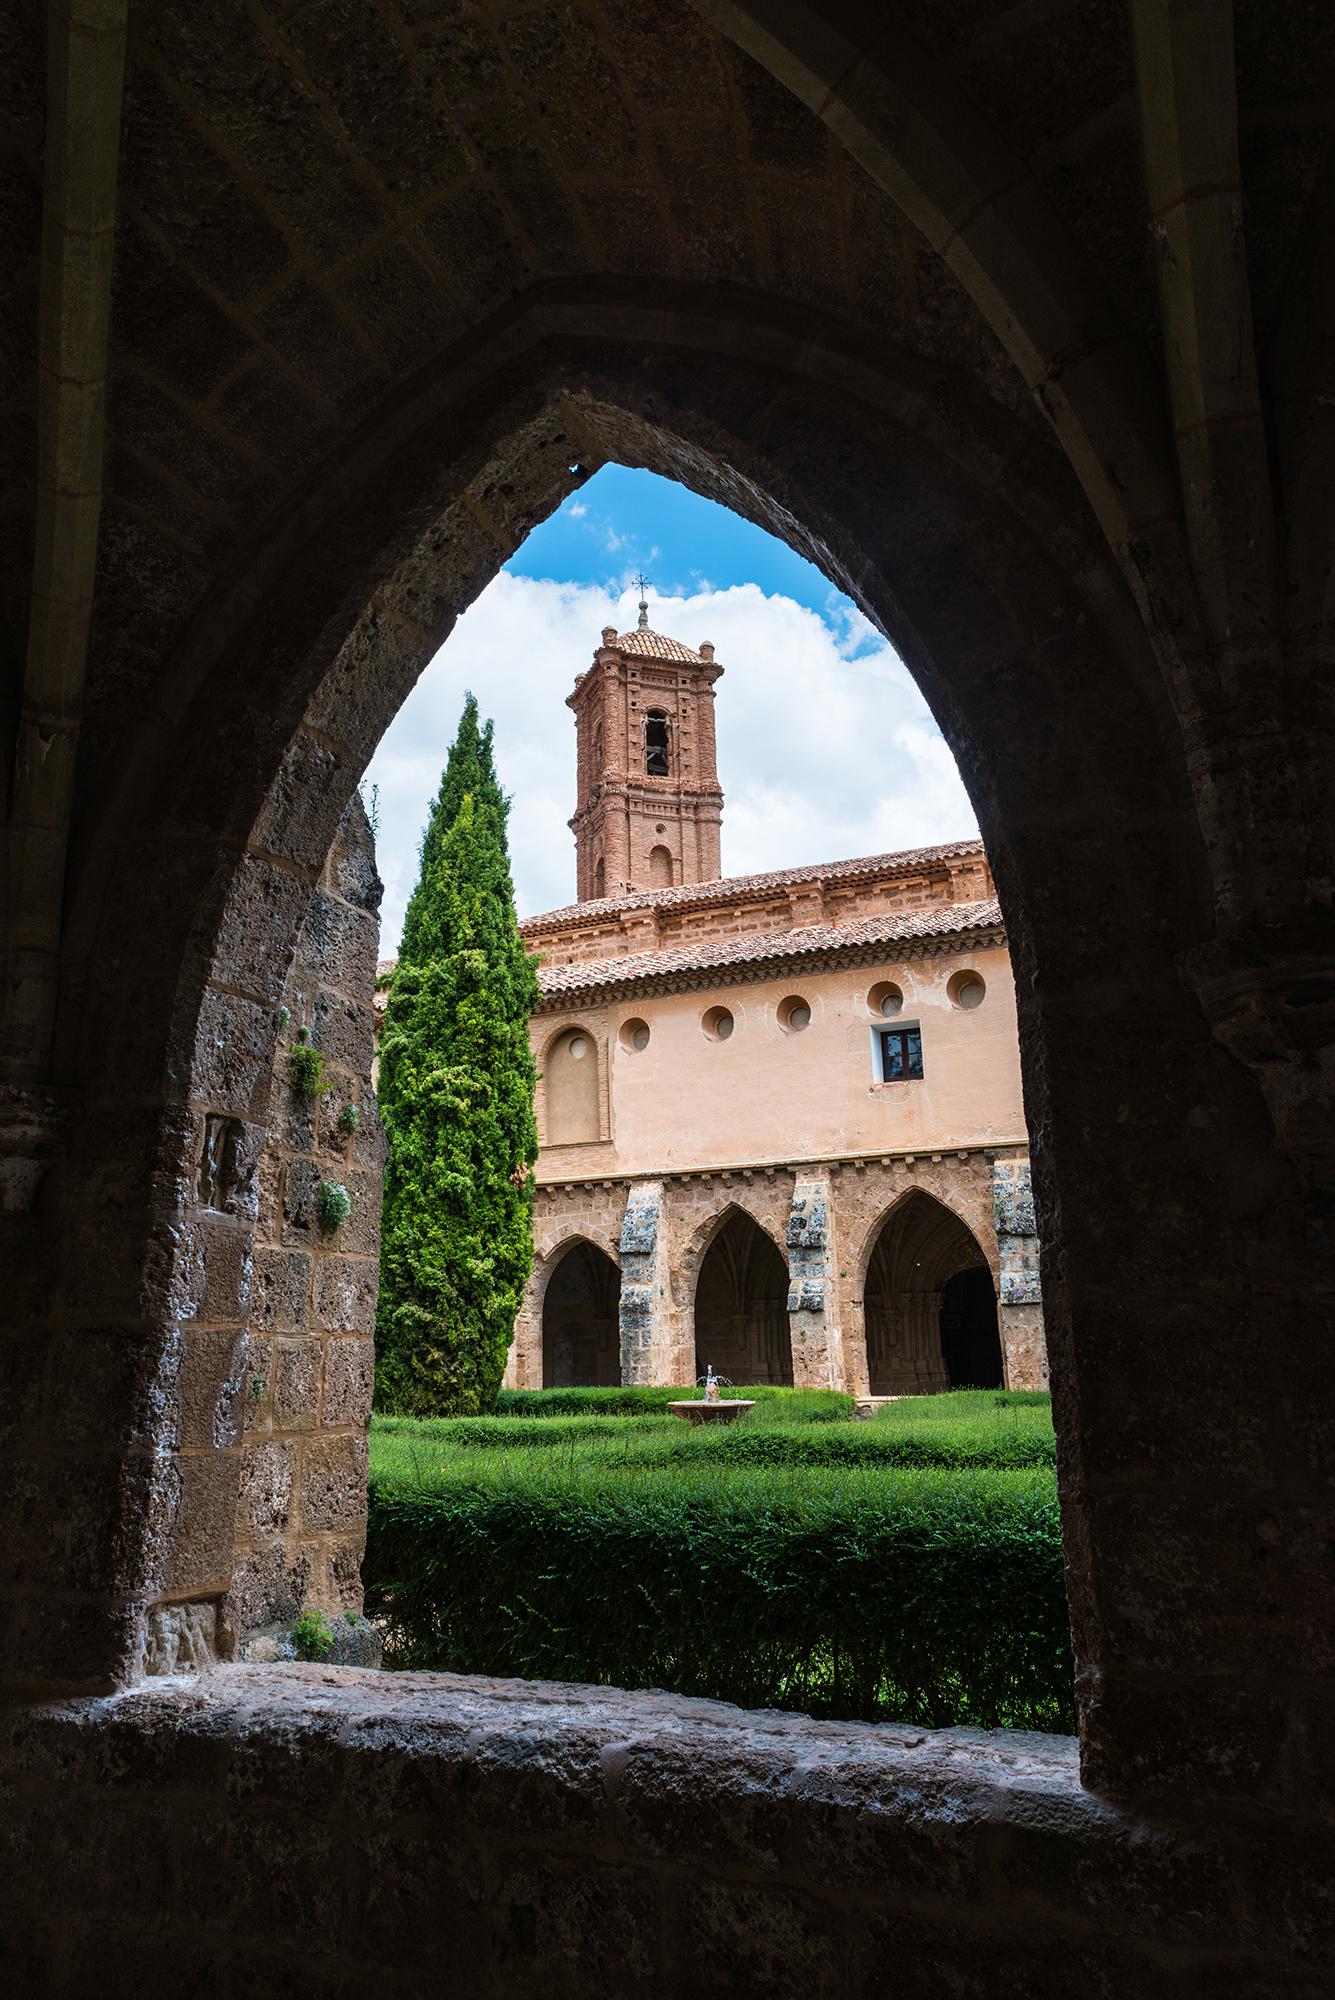 Corridor inside the cloister of the Monastery of Piedra